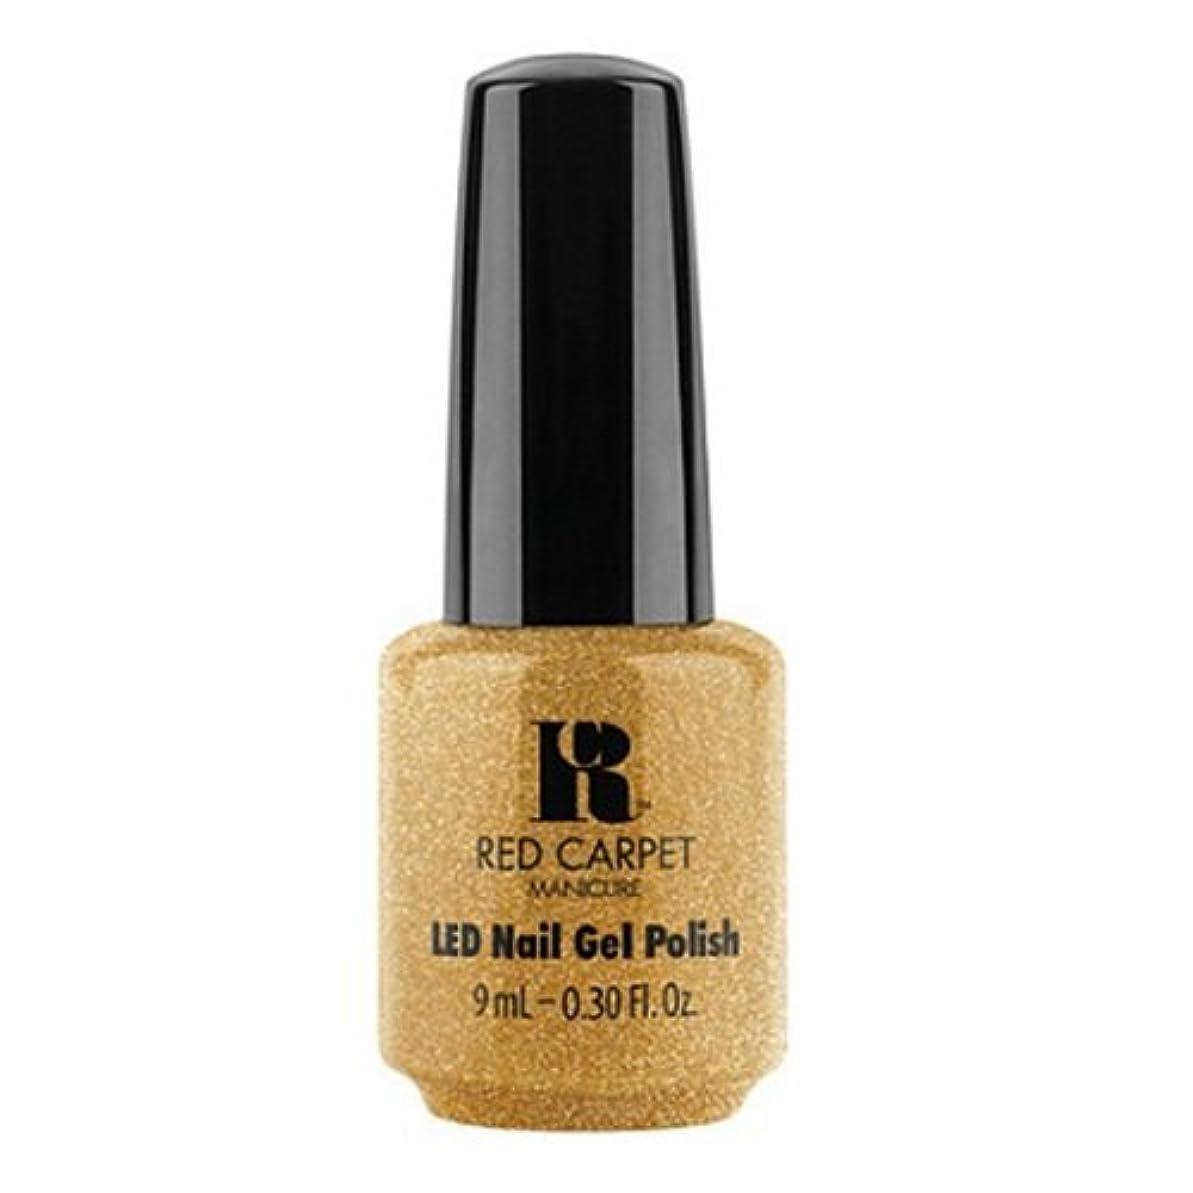 敵対的部門船尾Red Carpet Manicure - LED Nail Gel Polish - Glam & Gorge - 0.3oz / 9ml